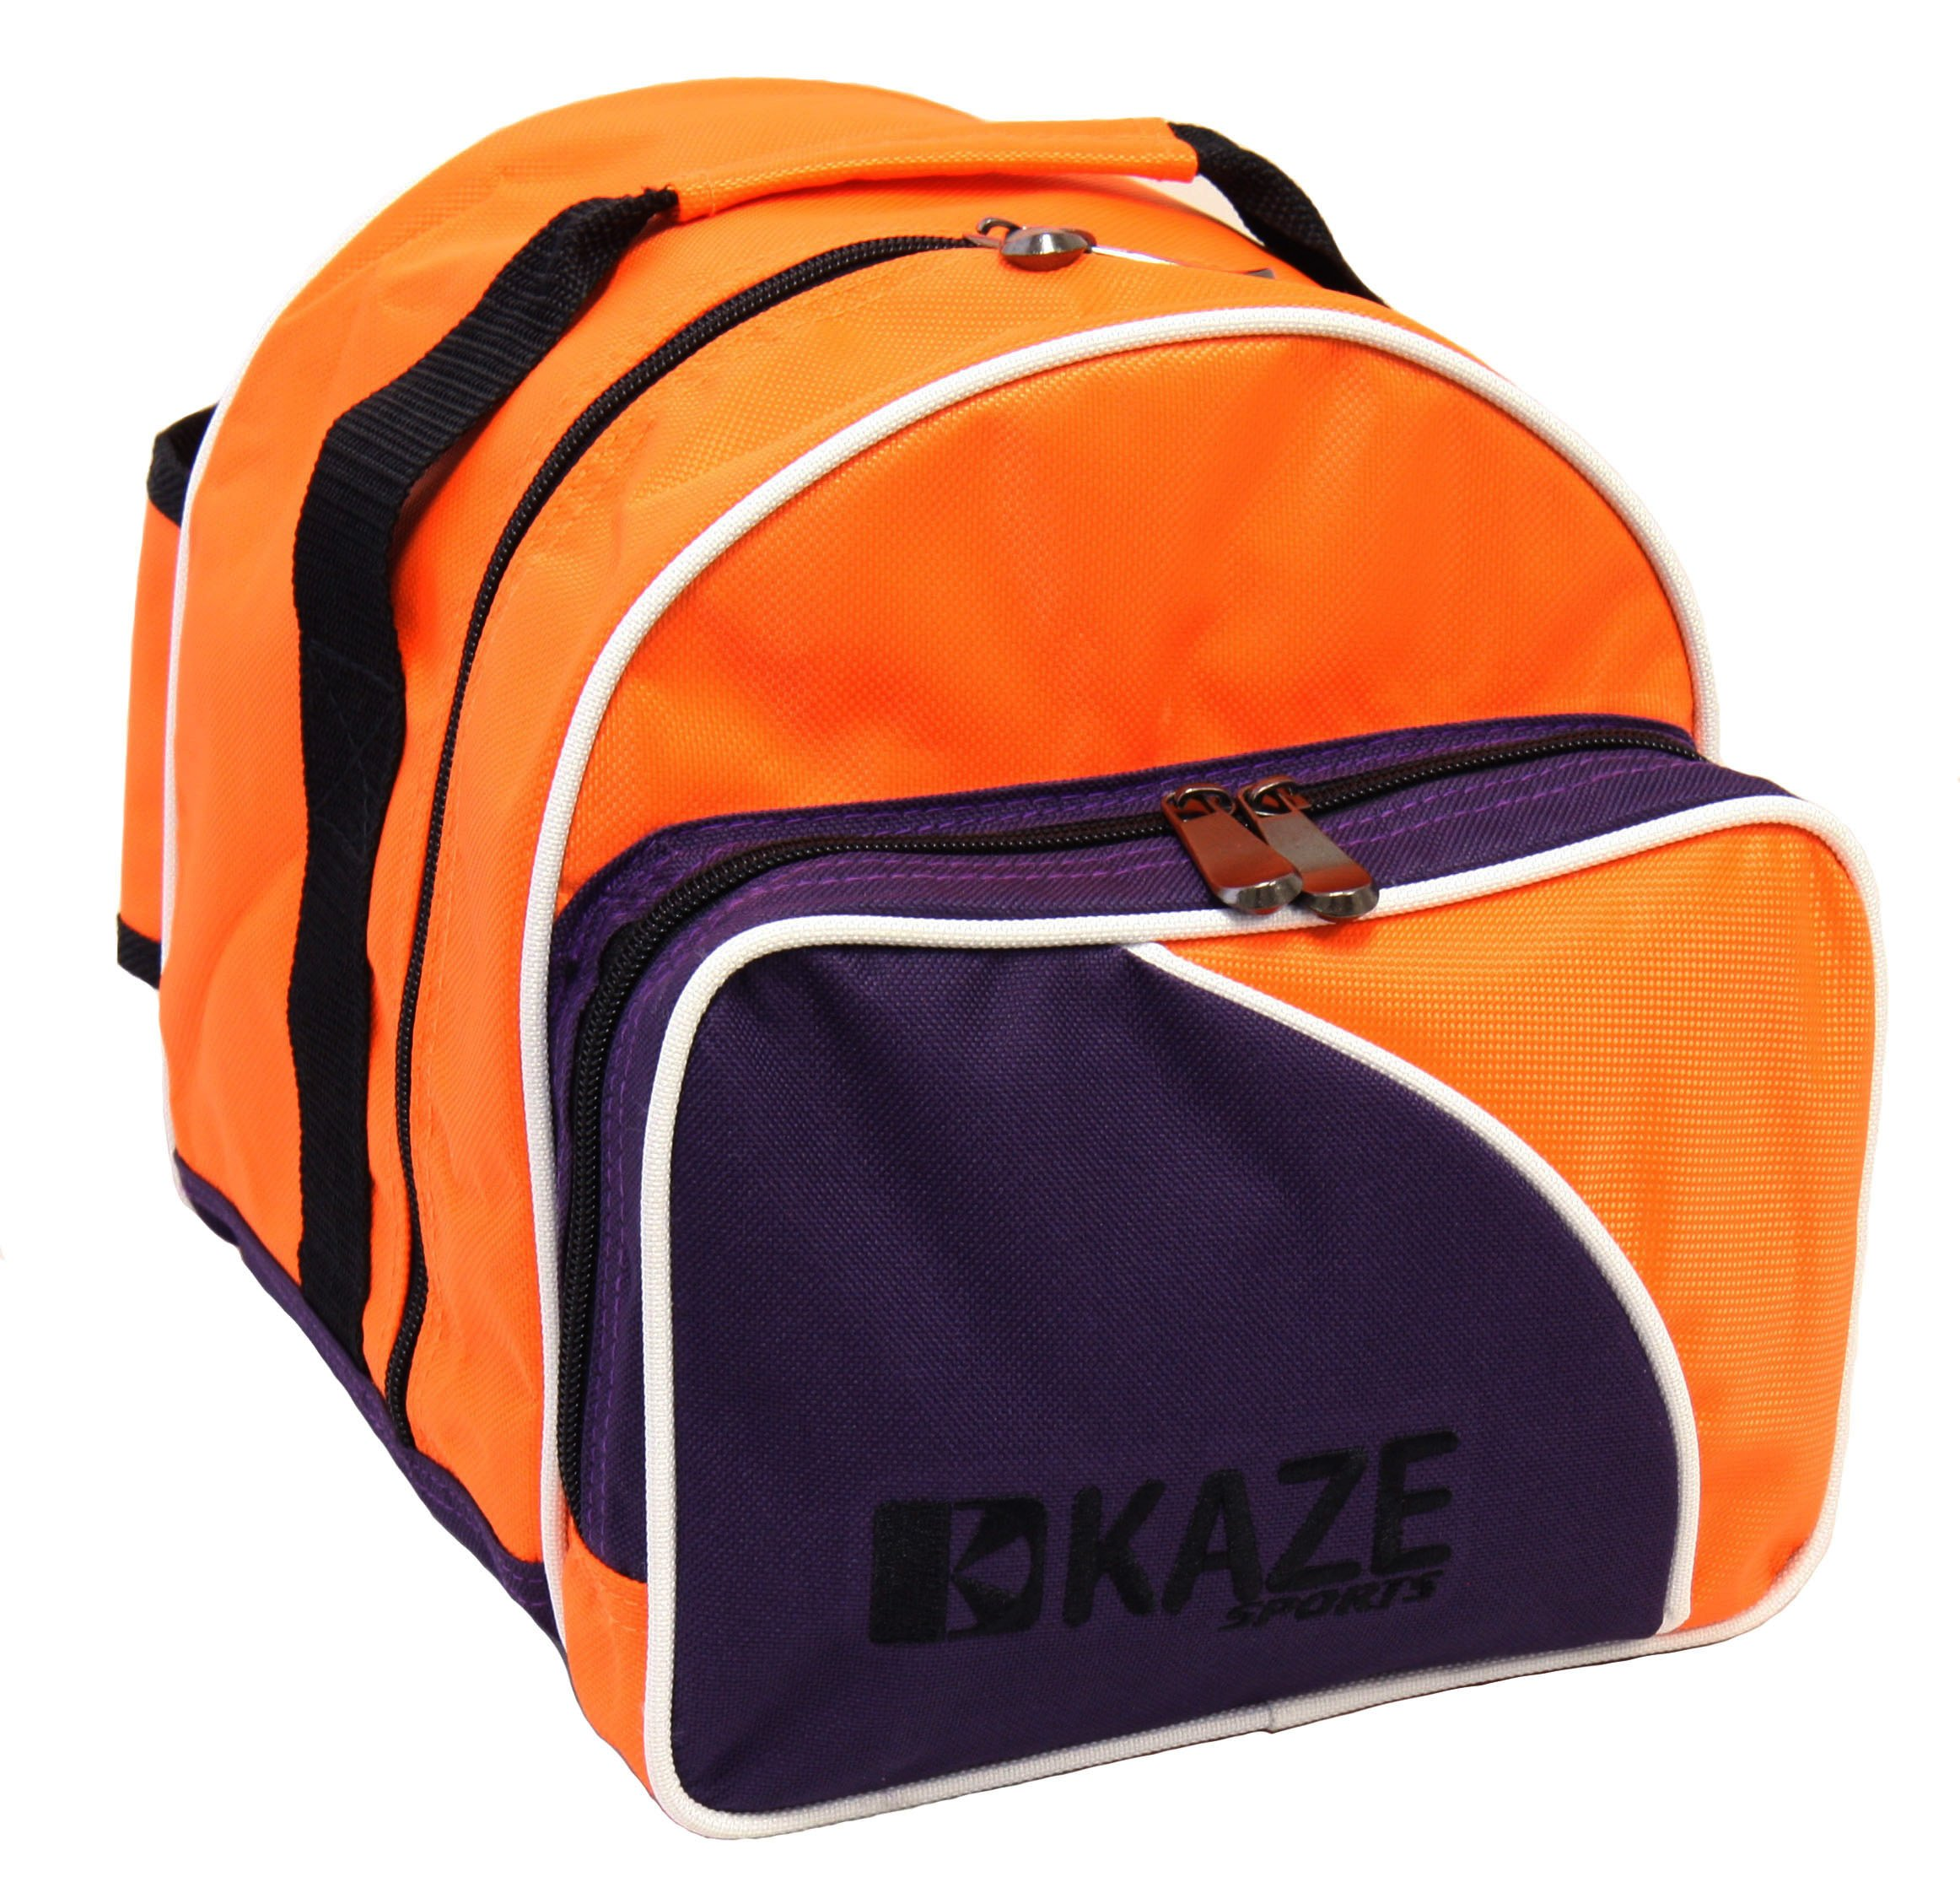 KAZE SPORTS 1 Ball Spare Kit Single Tote Bowling Add On Bag, Orange-Purple by KAZE SPORTS